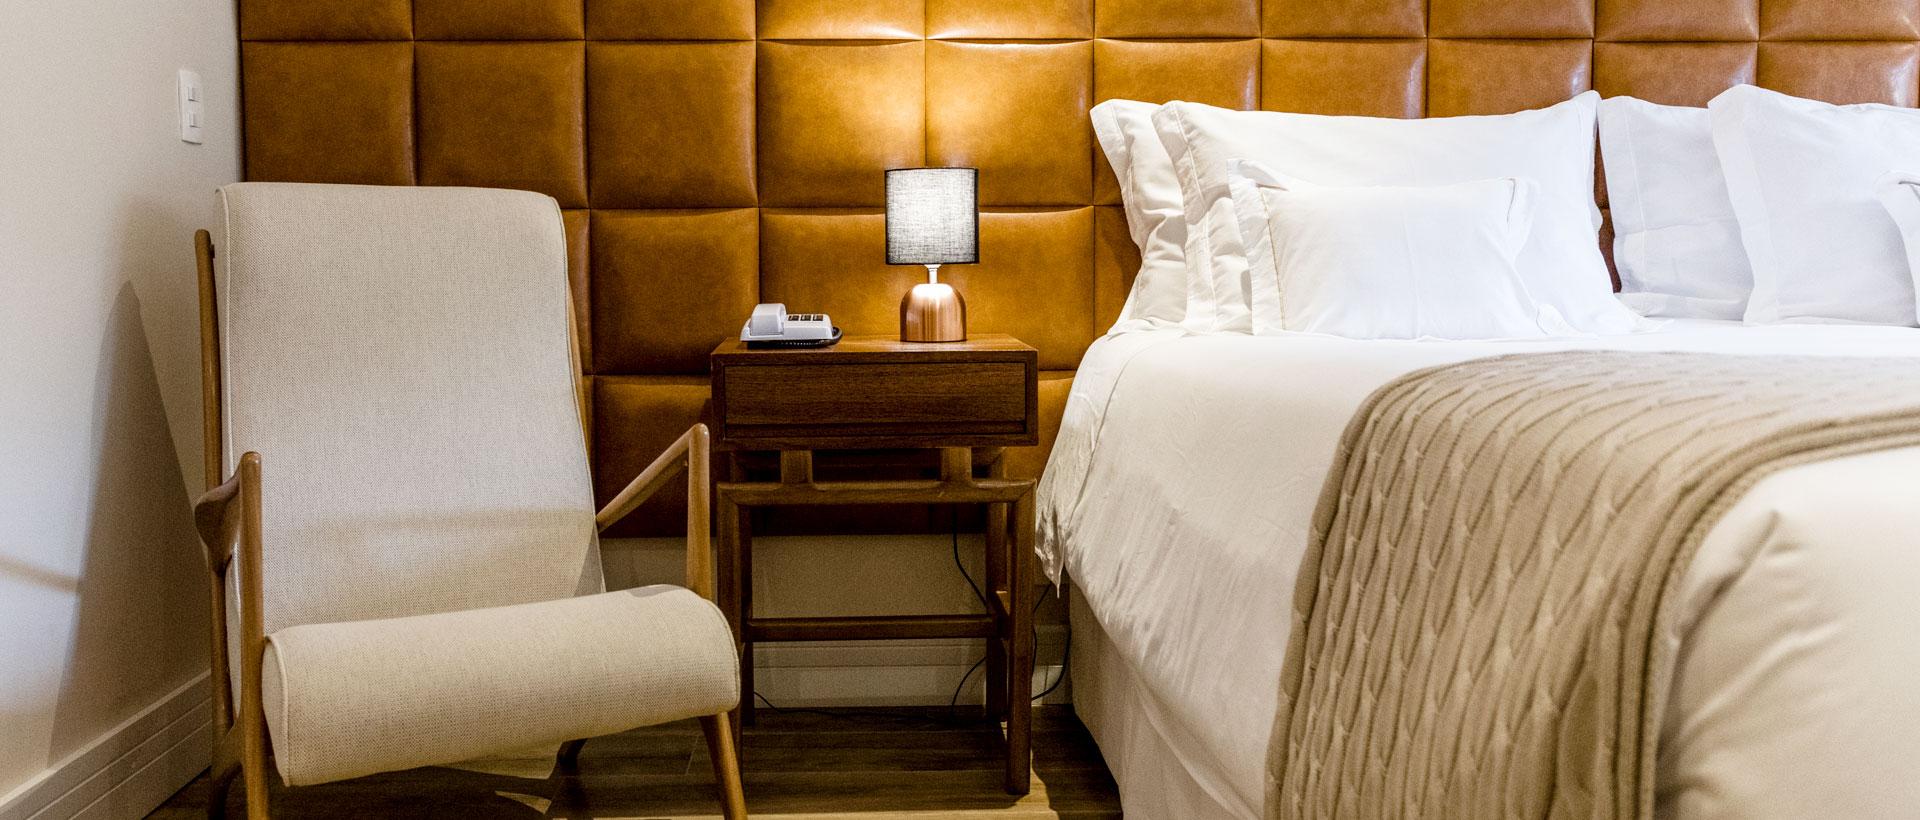 platanus-hotel-boutique-quebra-noz-conforto-e-natureza2